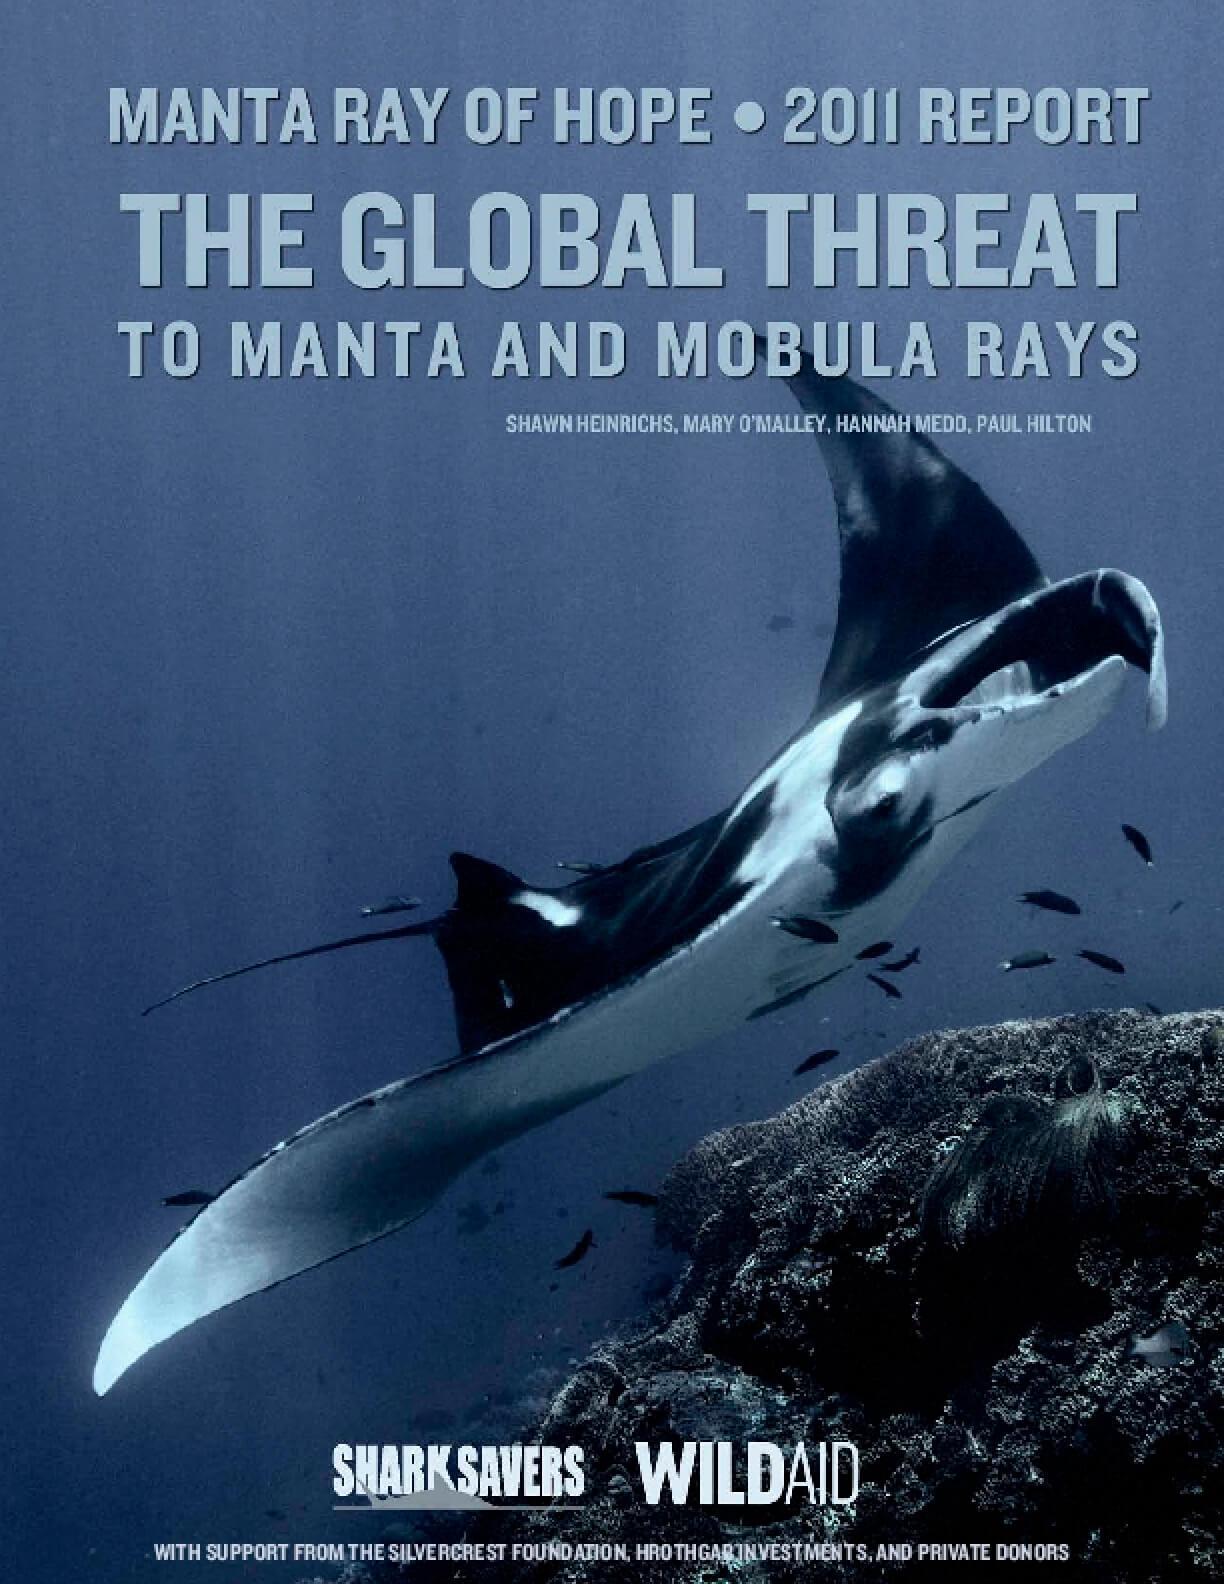 The Global Threat to Manta and Mobula Rays